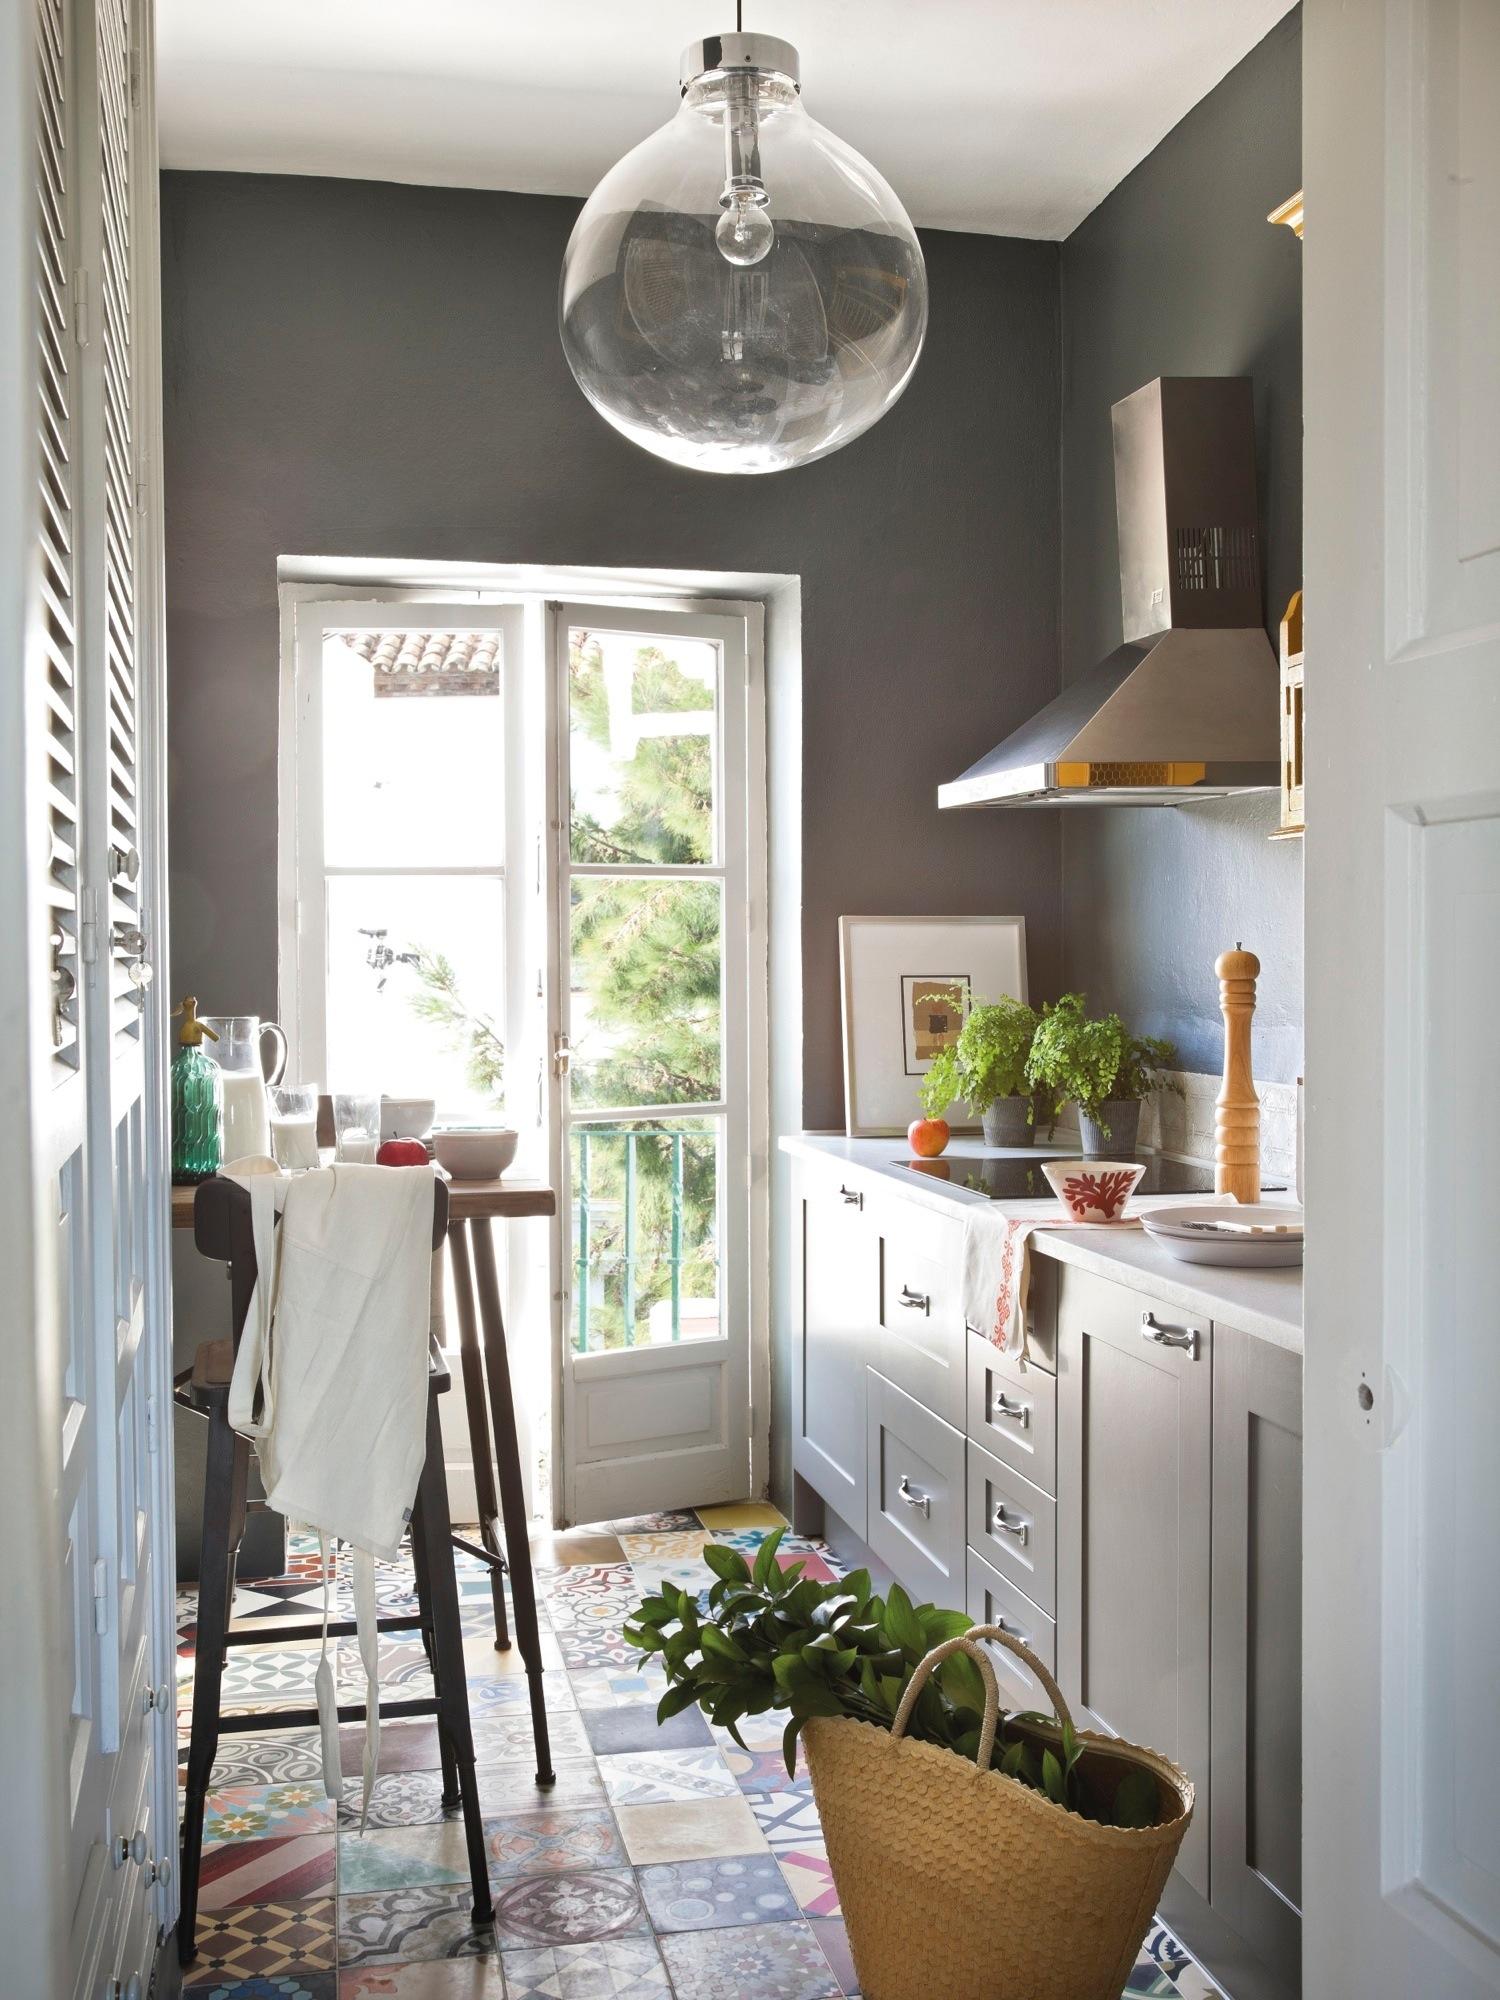 15 fotos de cocinas peque as bien aprovechadas - Cocinas pintadas fotos ...